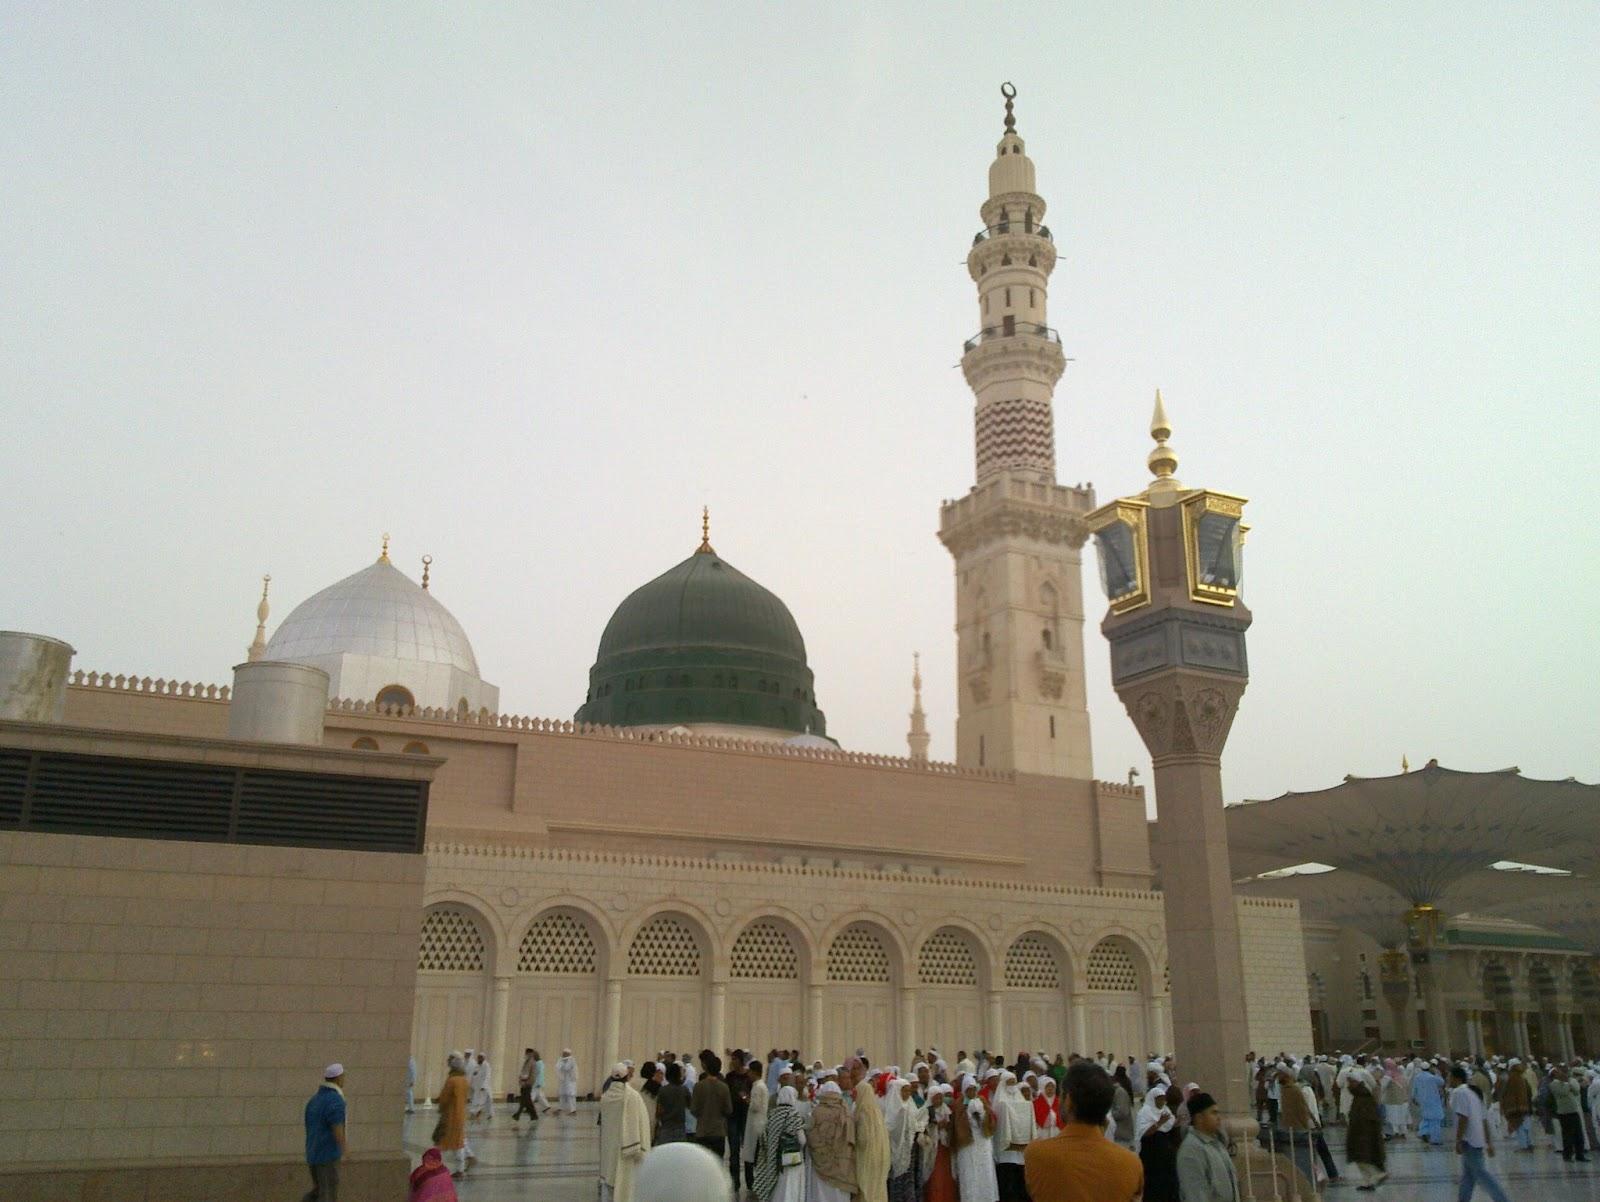 Islamic 3d Wallpapers Screensavers My Wallpaper Collection Madina Munawara Wallpapers Part 1